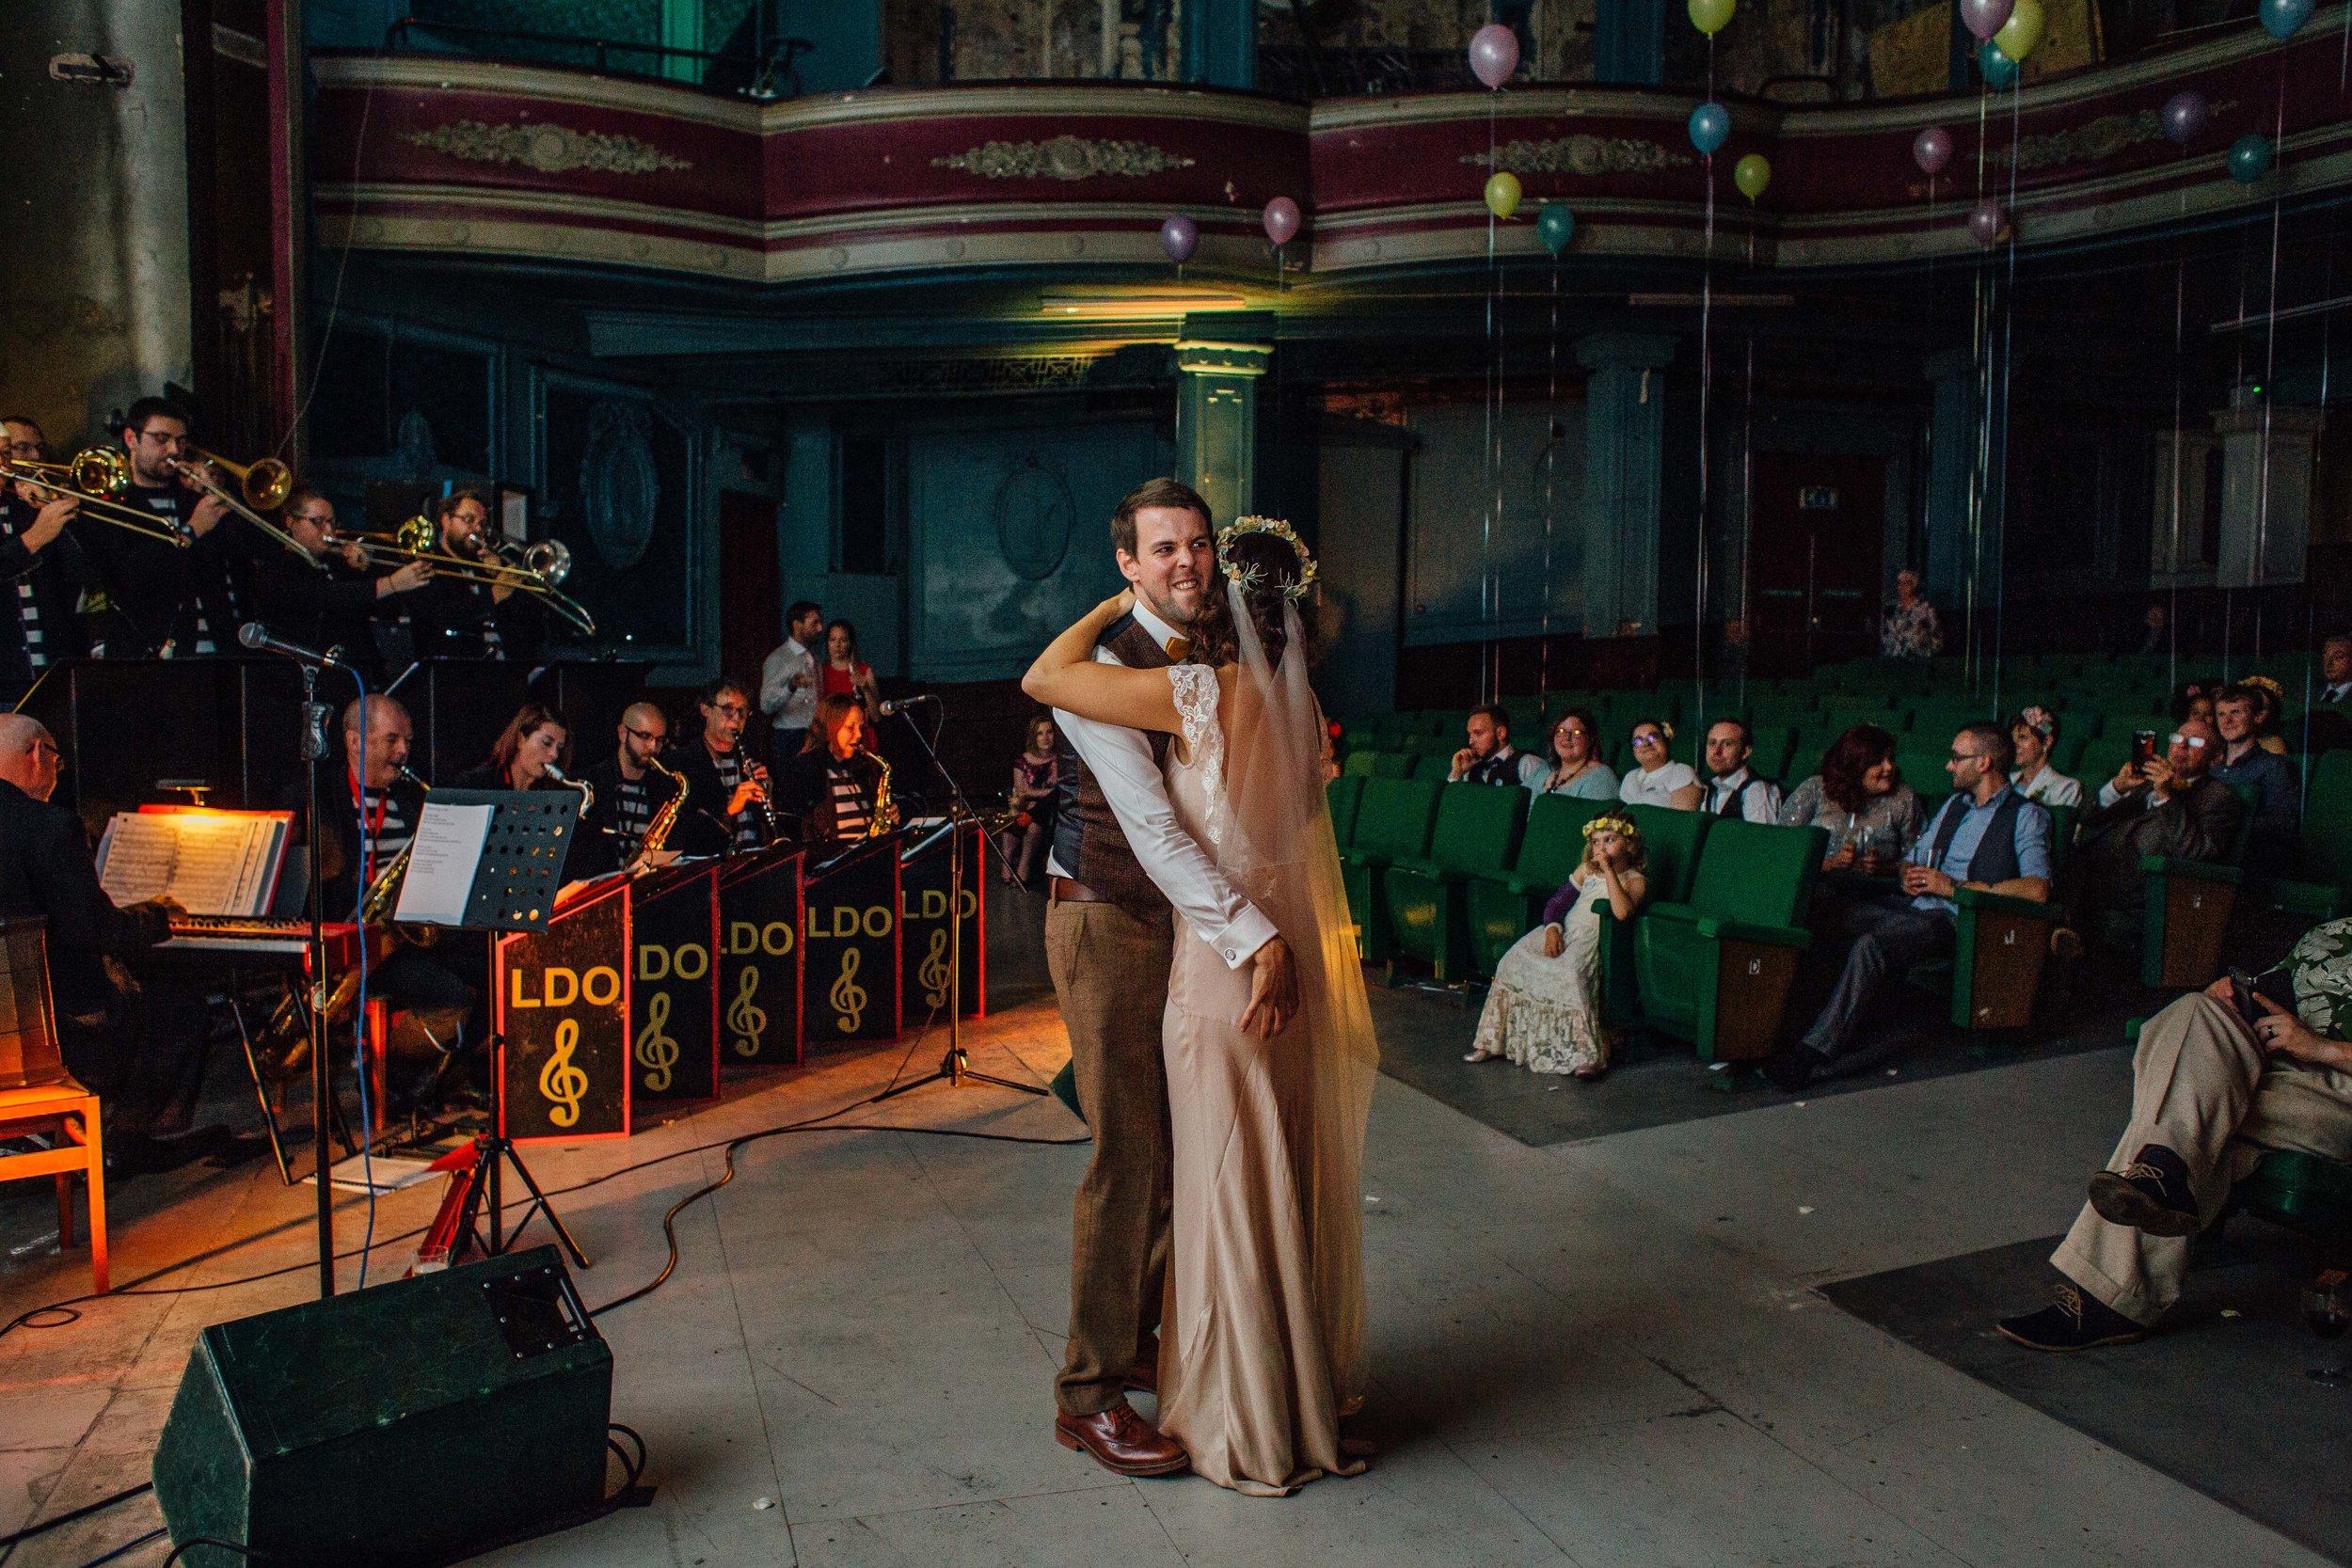 Katy-Bespoke-Veil-Sheffield-Wedding-Wes-Anderson-Susanna-Greening-Derbyshire-29